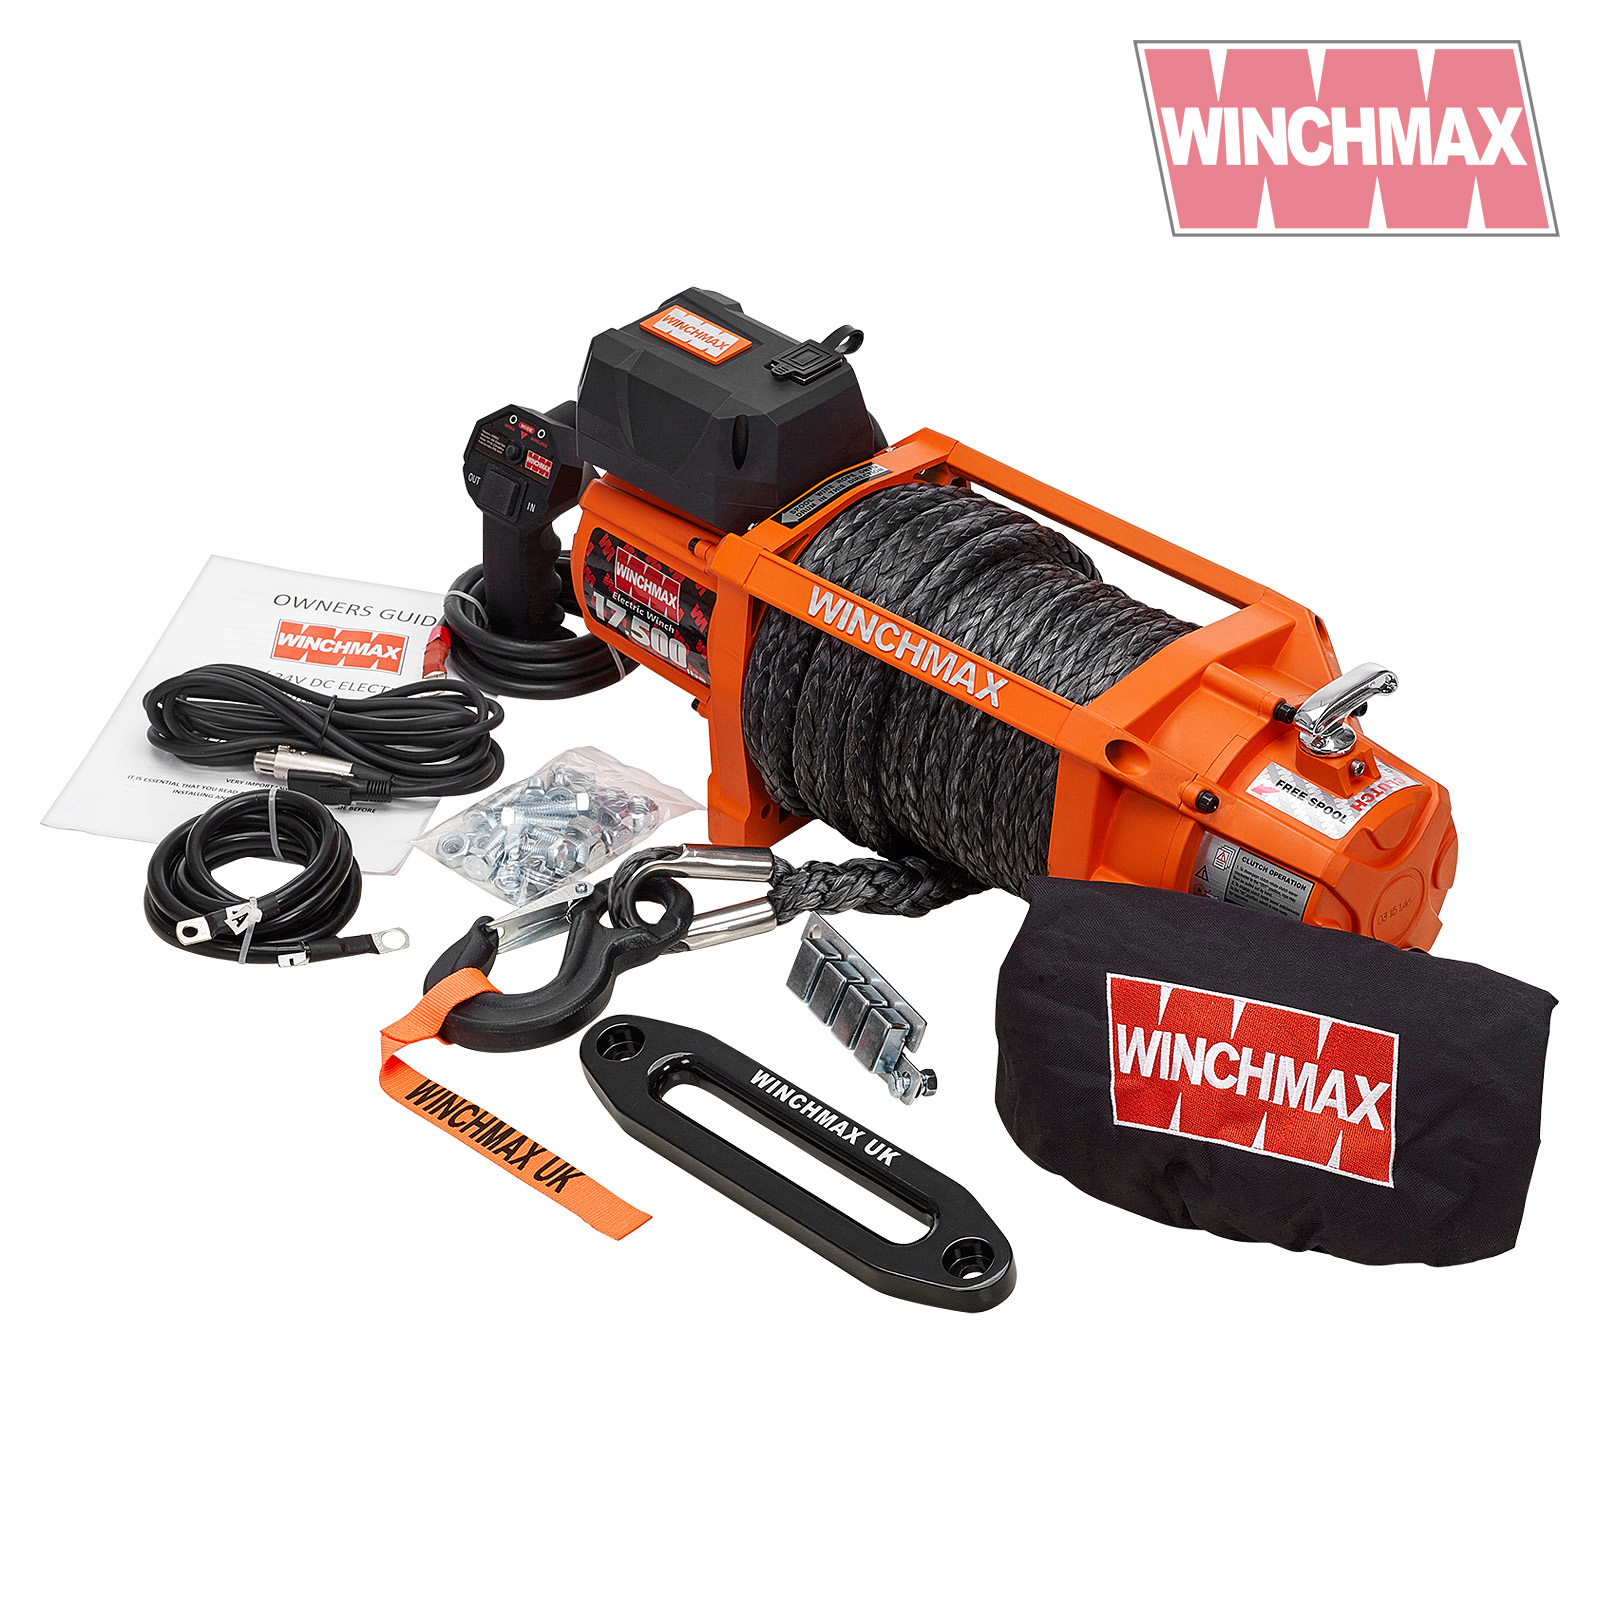 Wmsl1750012vsyn winchmax615198967 voltage removed white 16